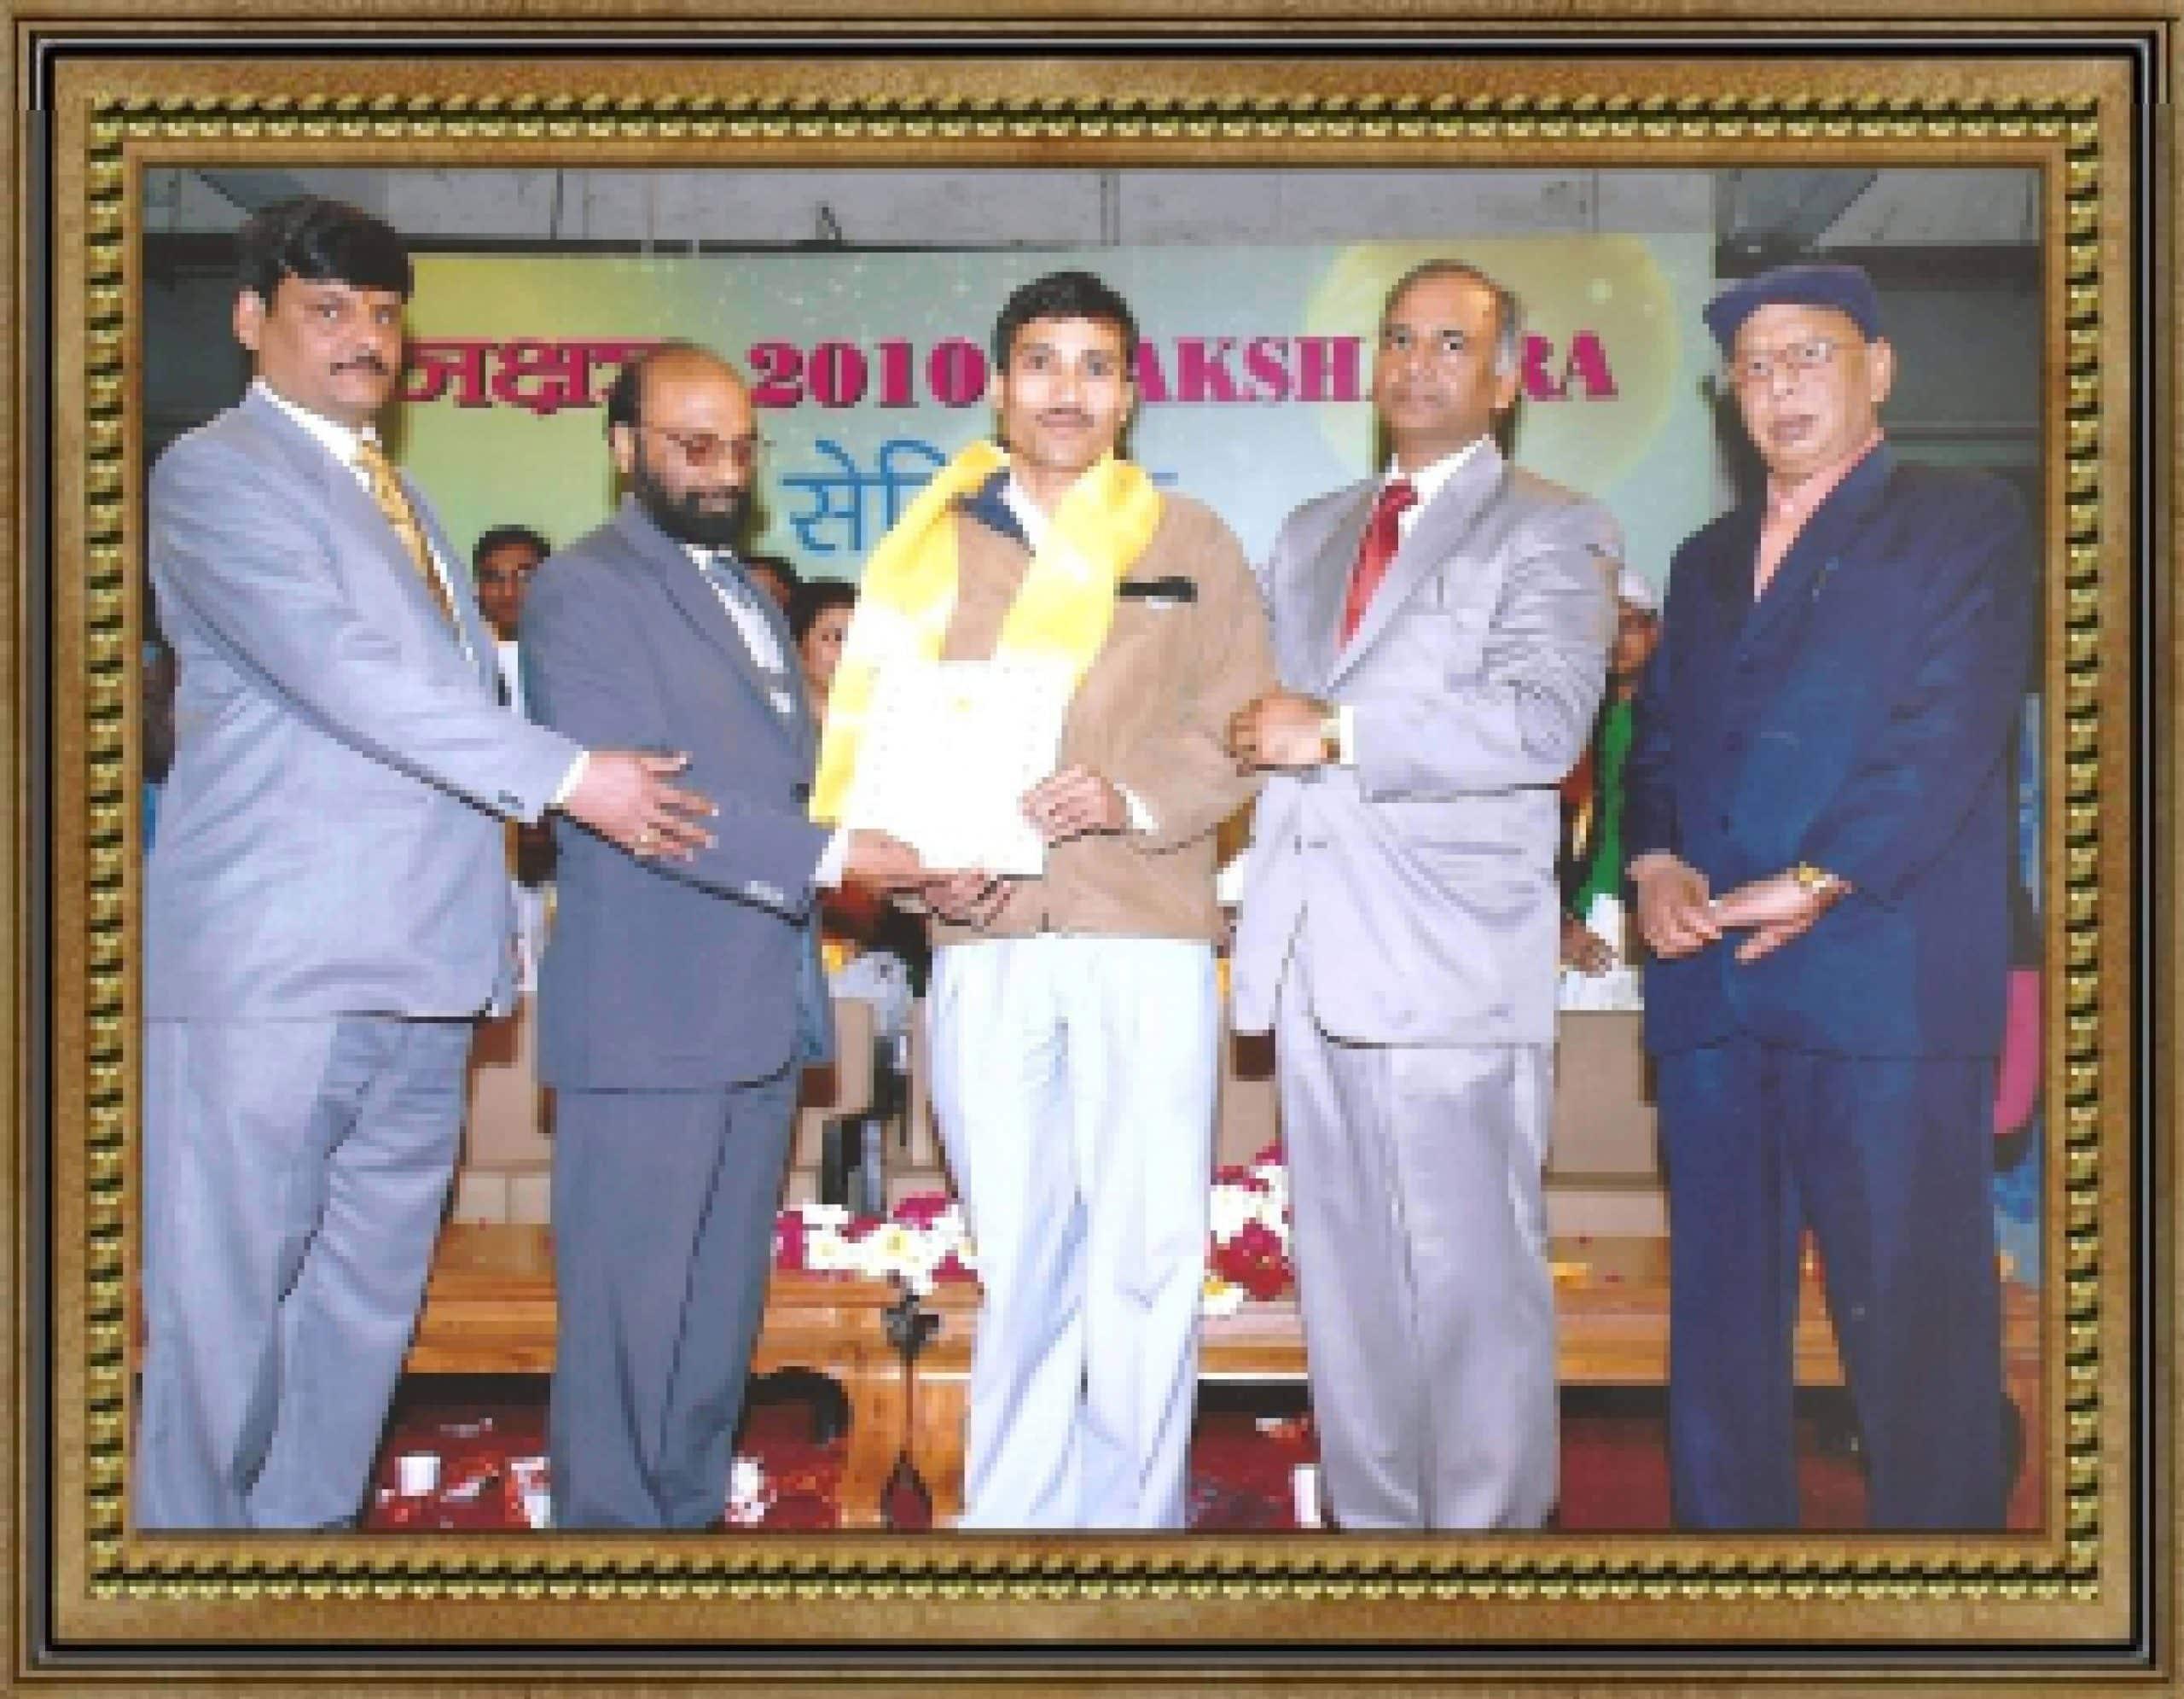 Jyotish Ratna, Jyotish Bhushan and Jyotish Prabhakar Awards